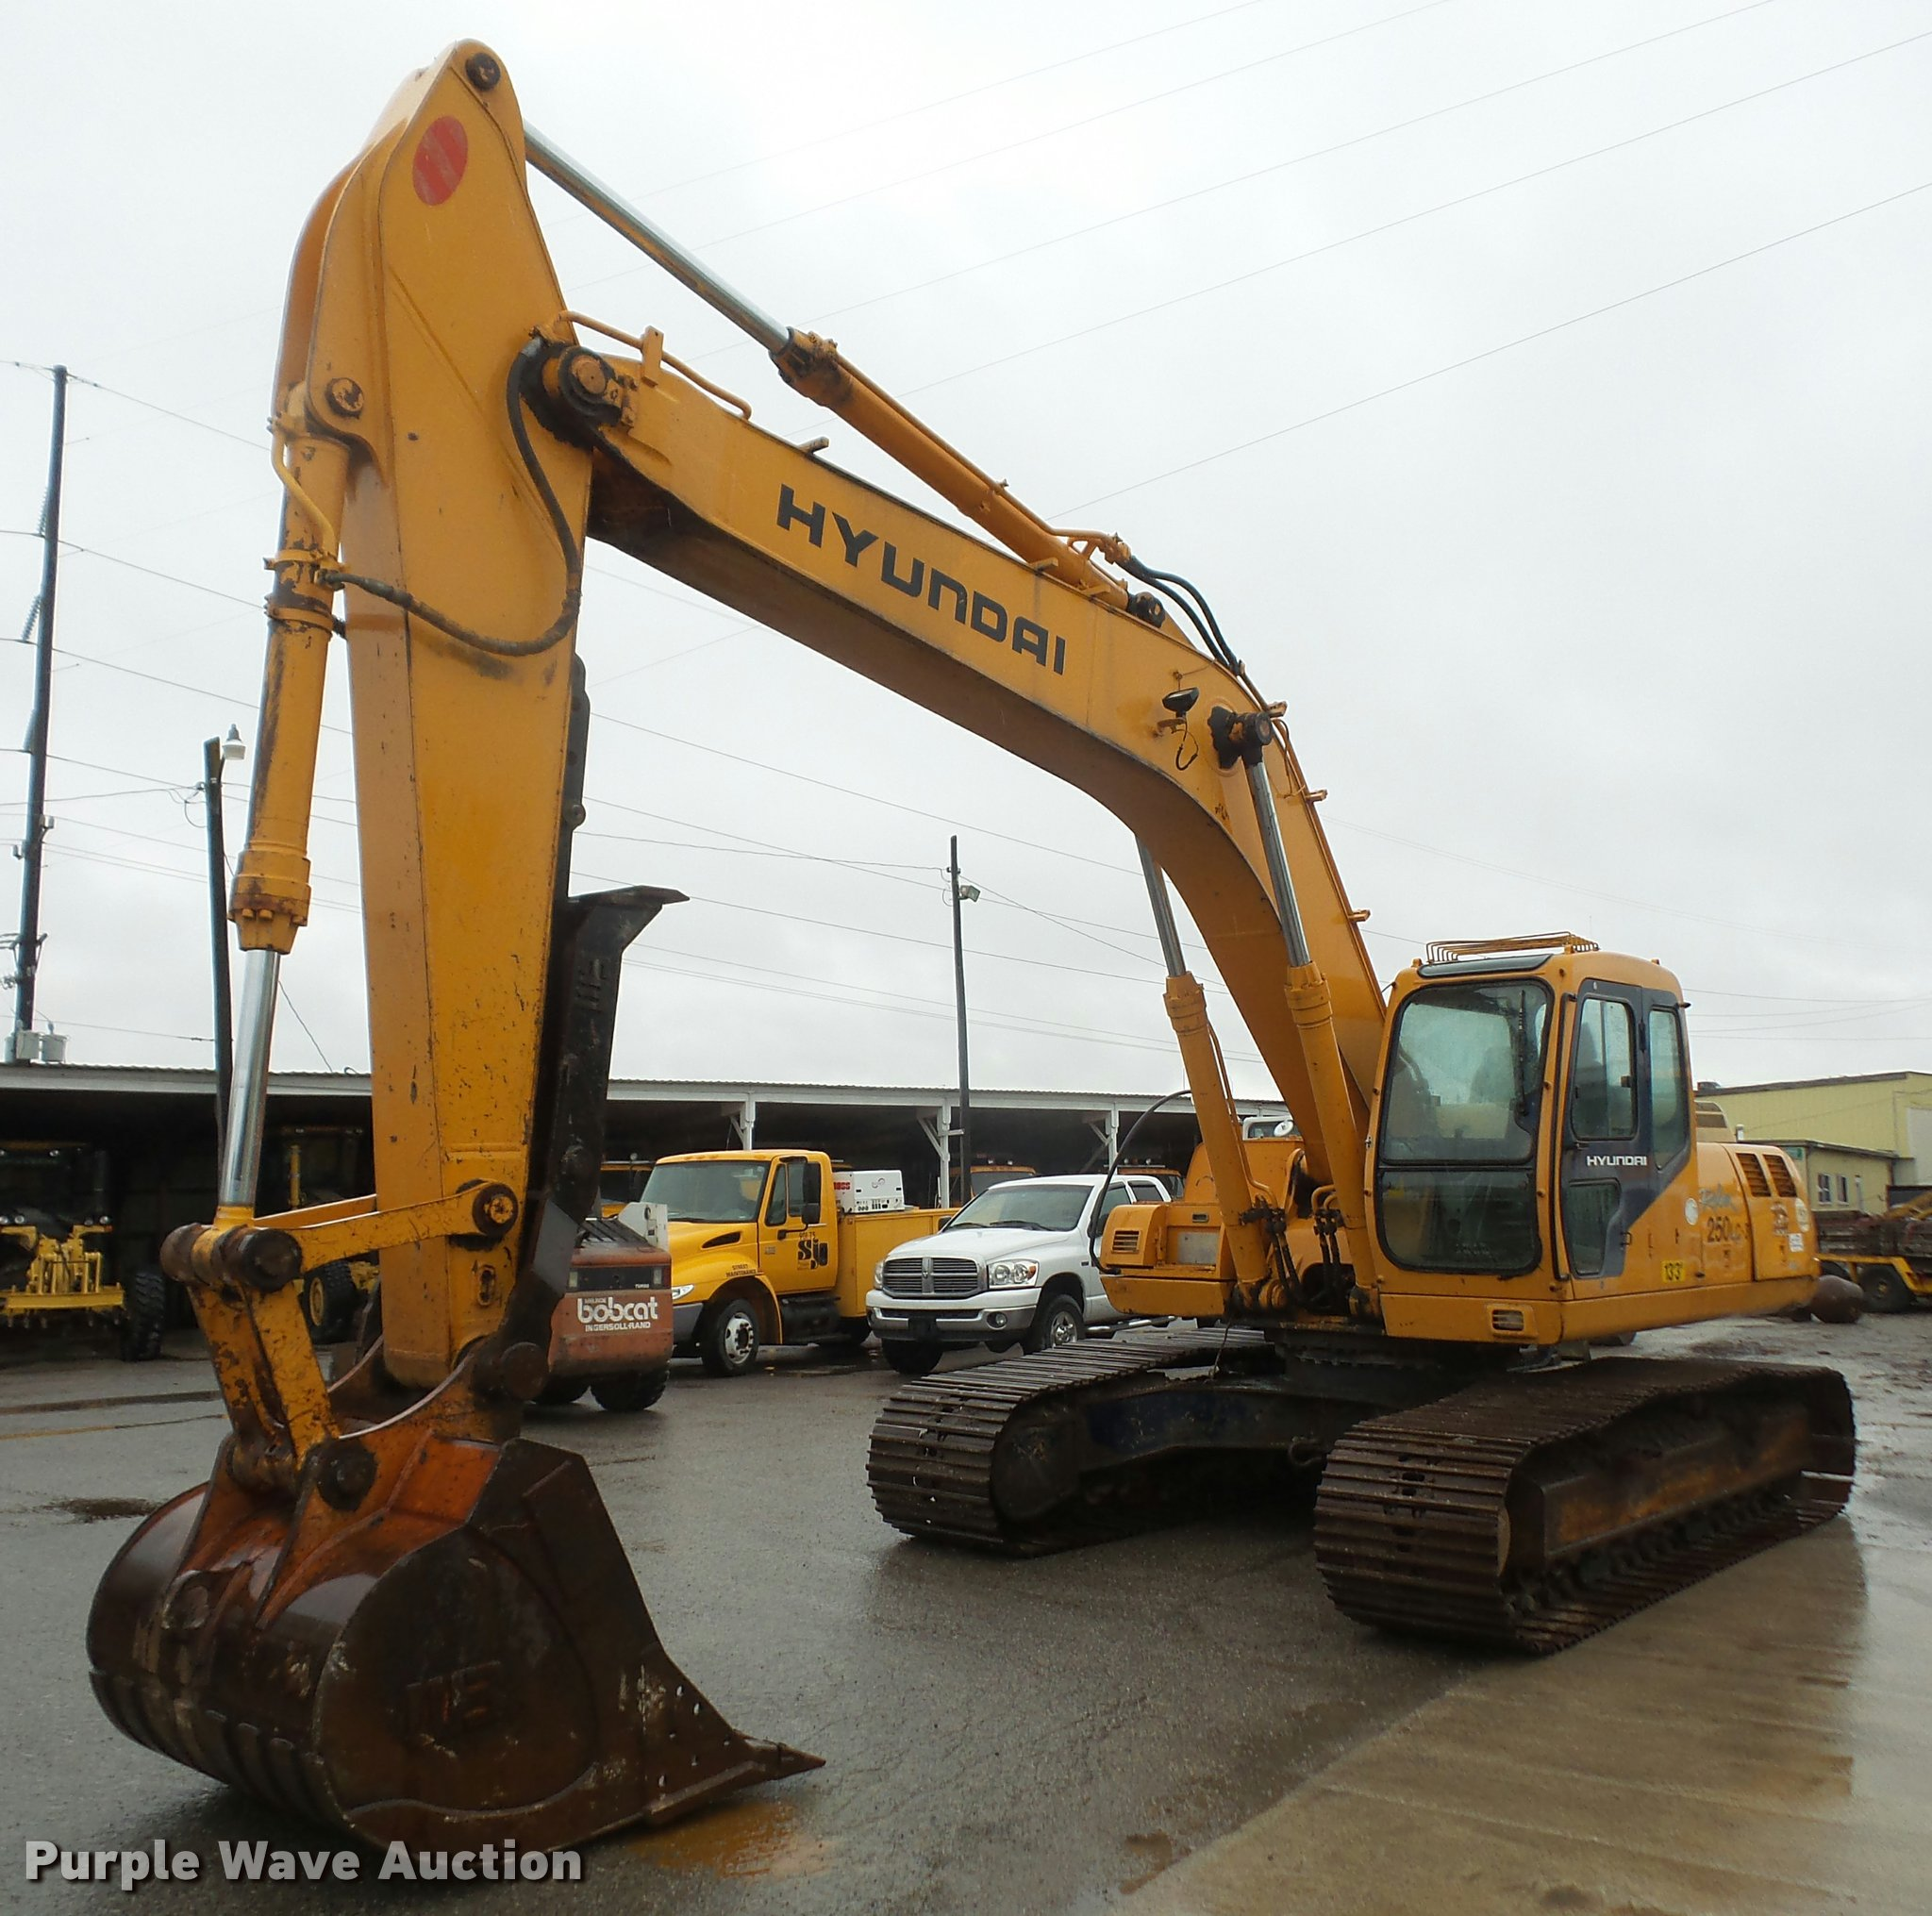 DA8201 image for item DA8201 1998 Hyundai Robex 250LC-3 excavator